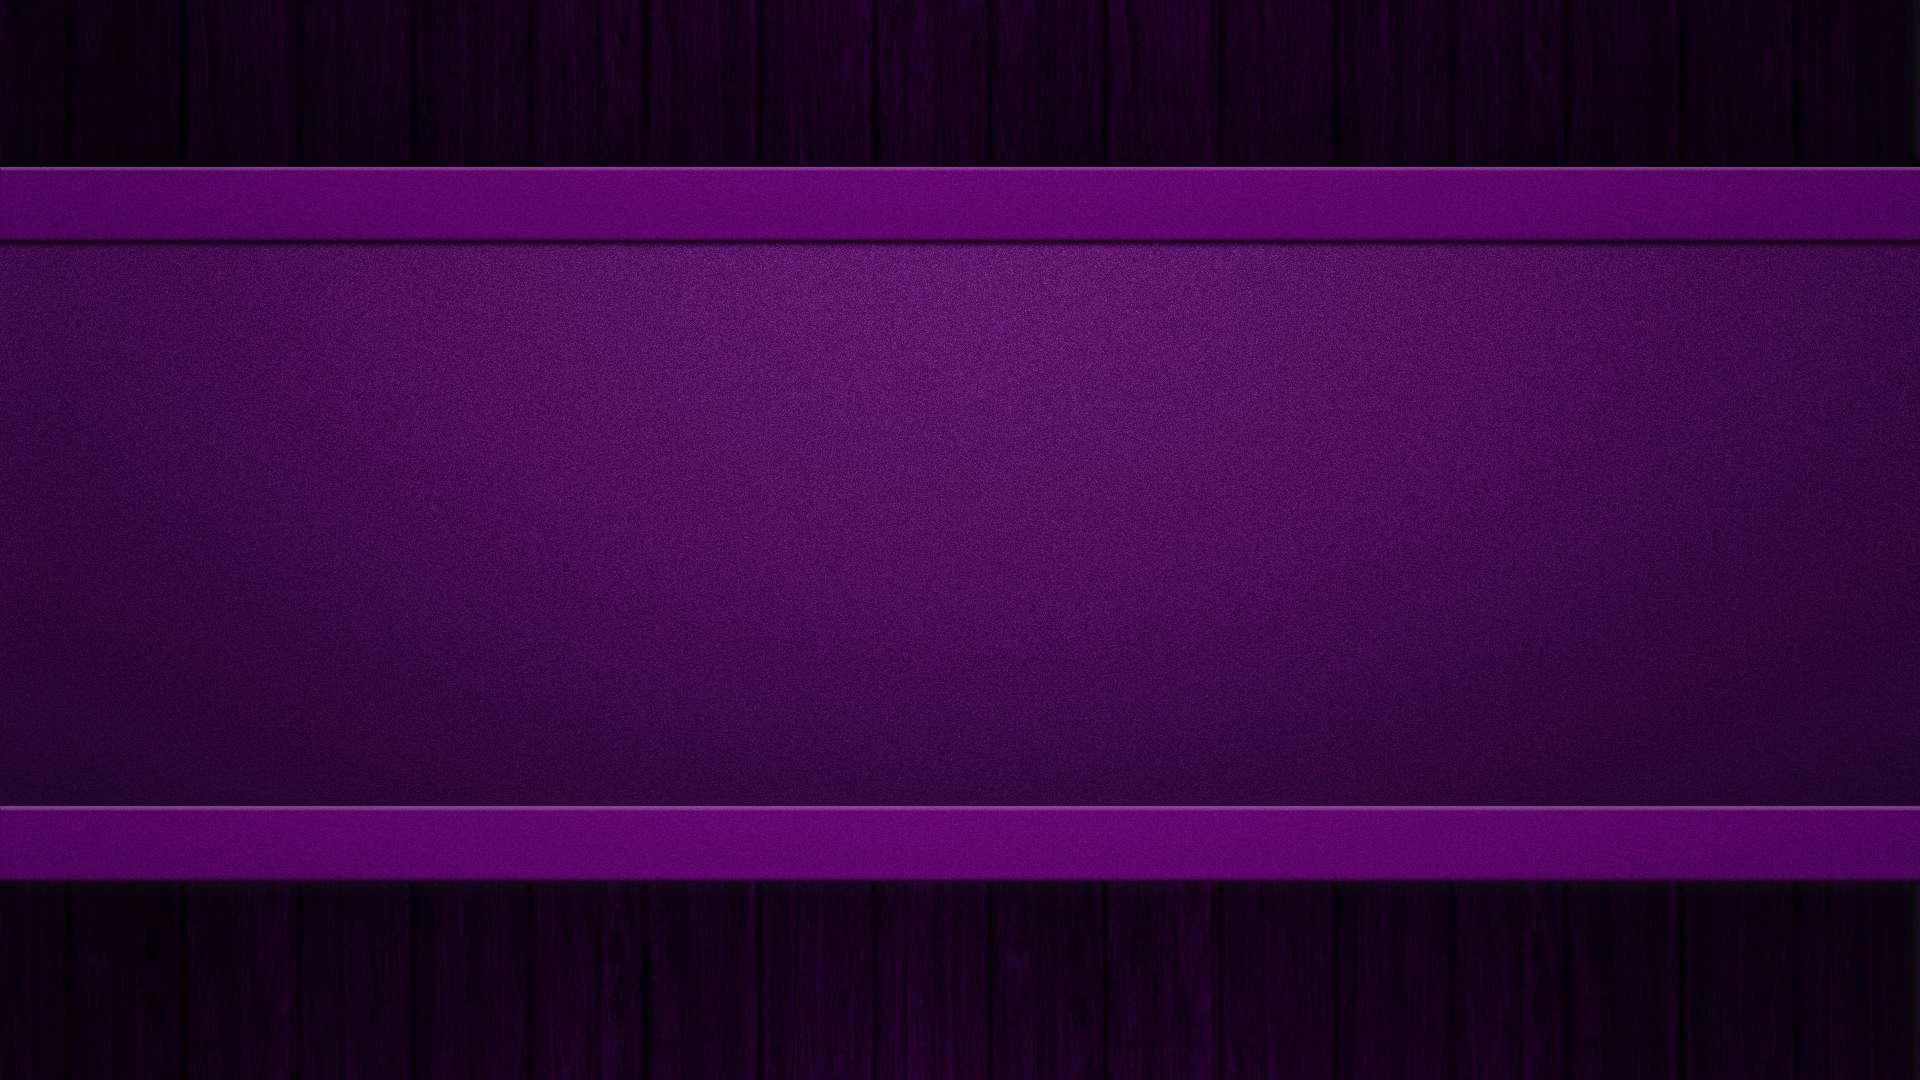 hd backgrounds purple - photo #20